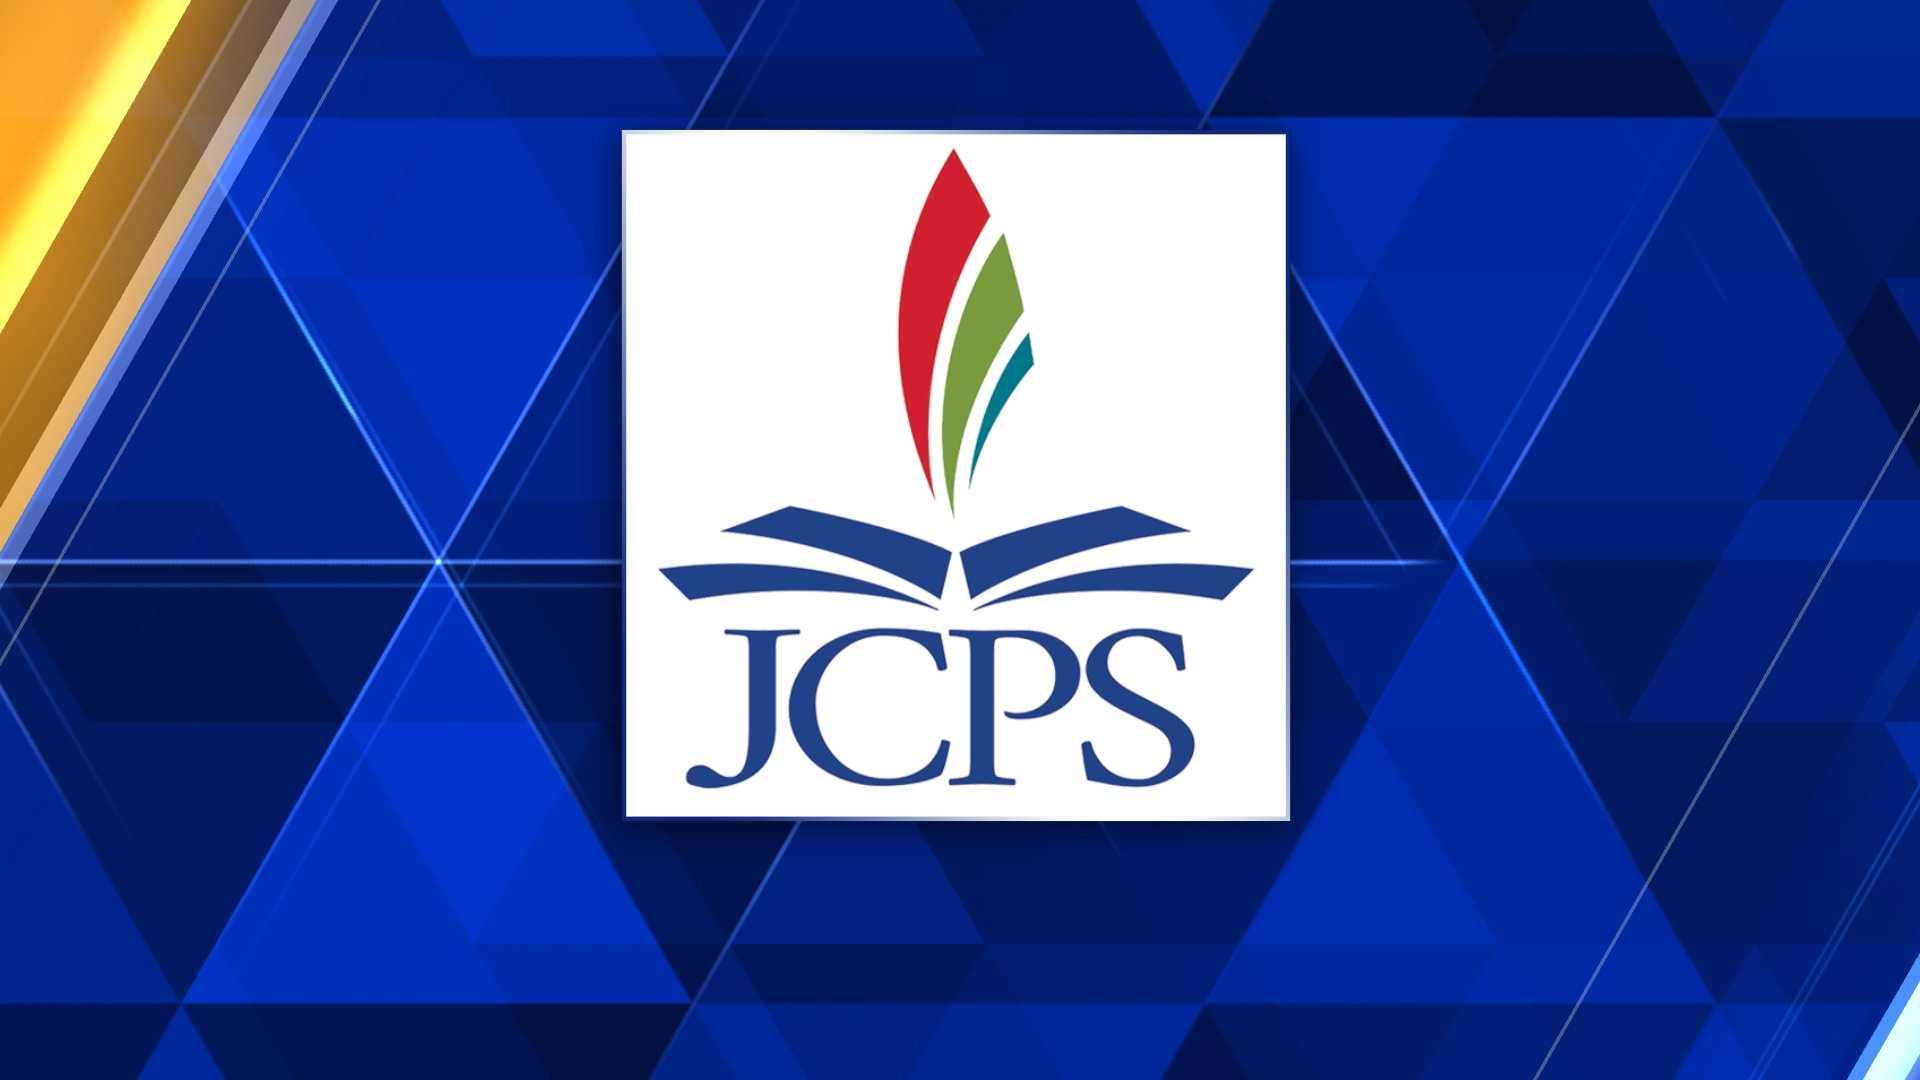 JCPS, generic, logo